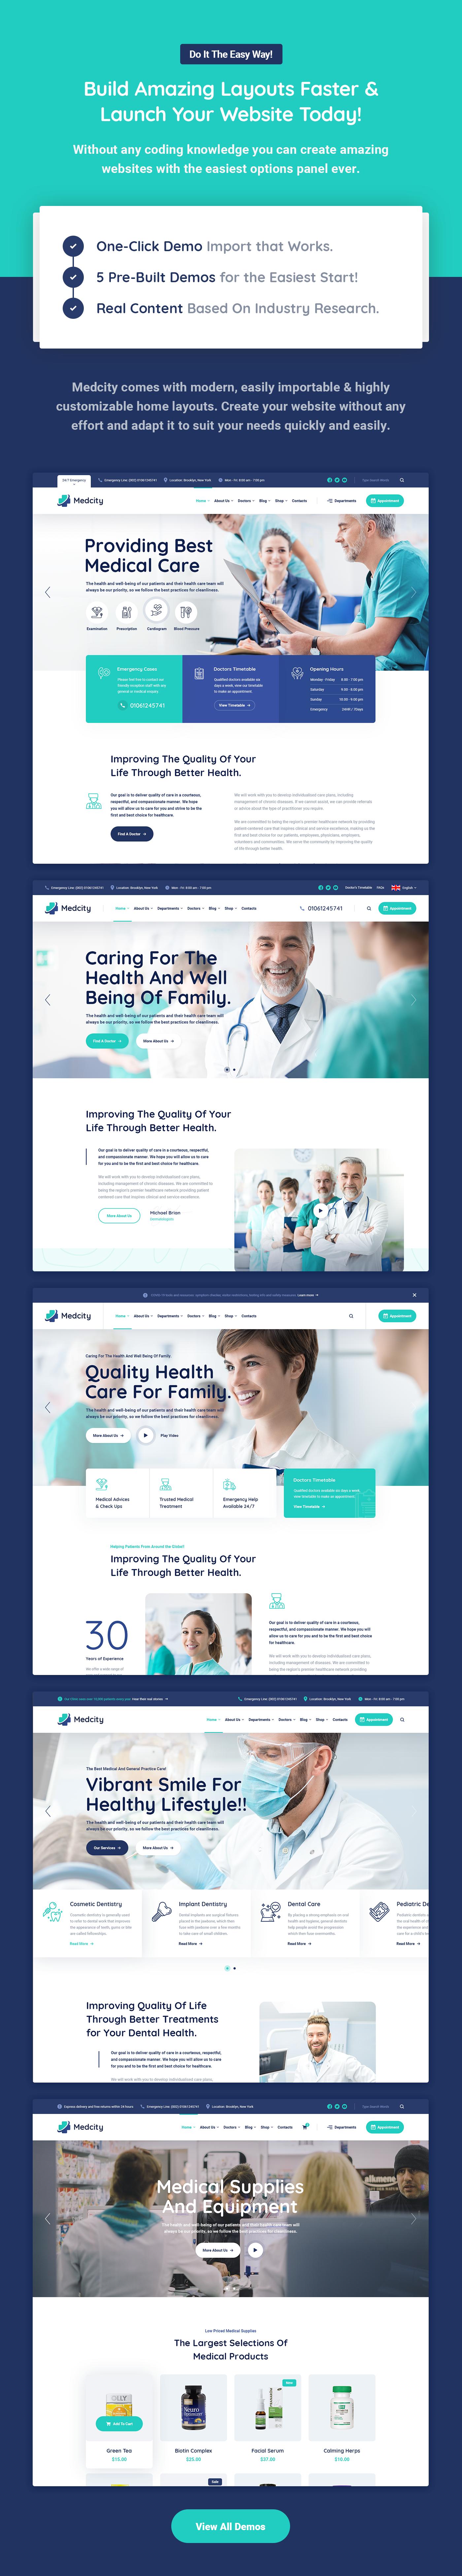 Medcity - Health & Medical WordPress Theme - 5